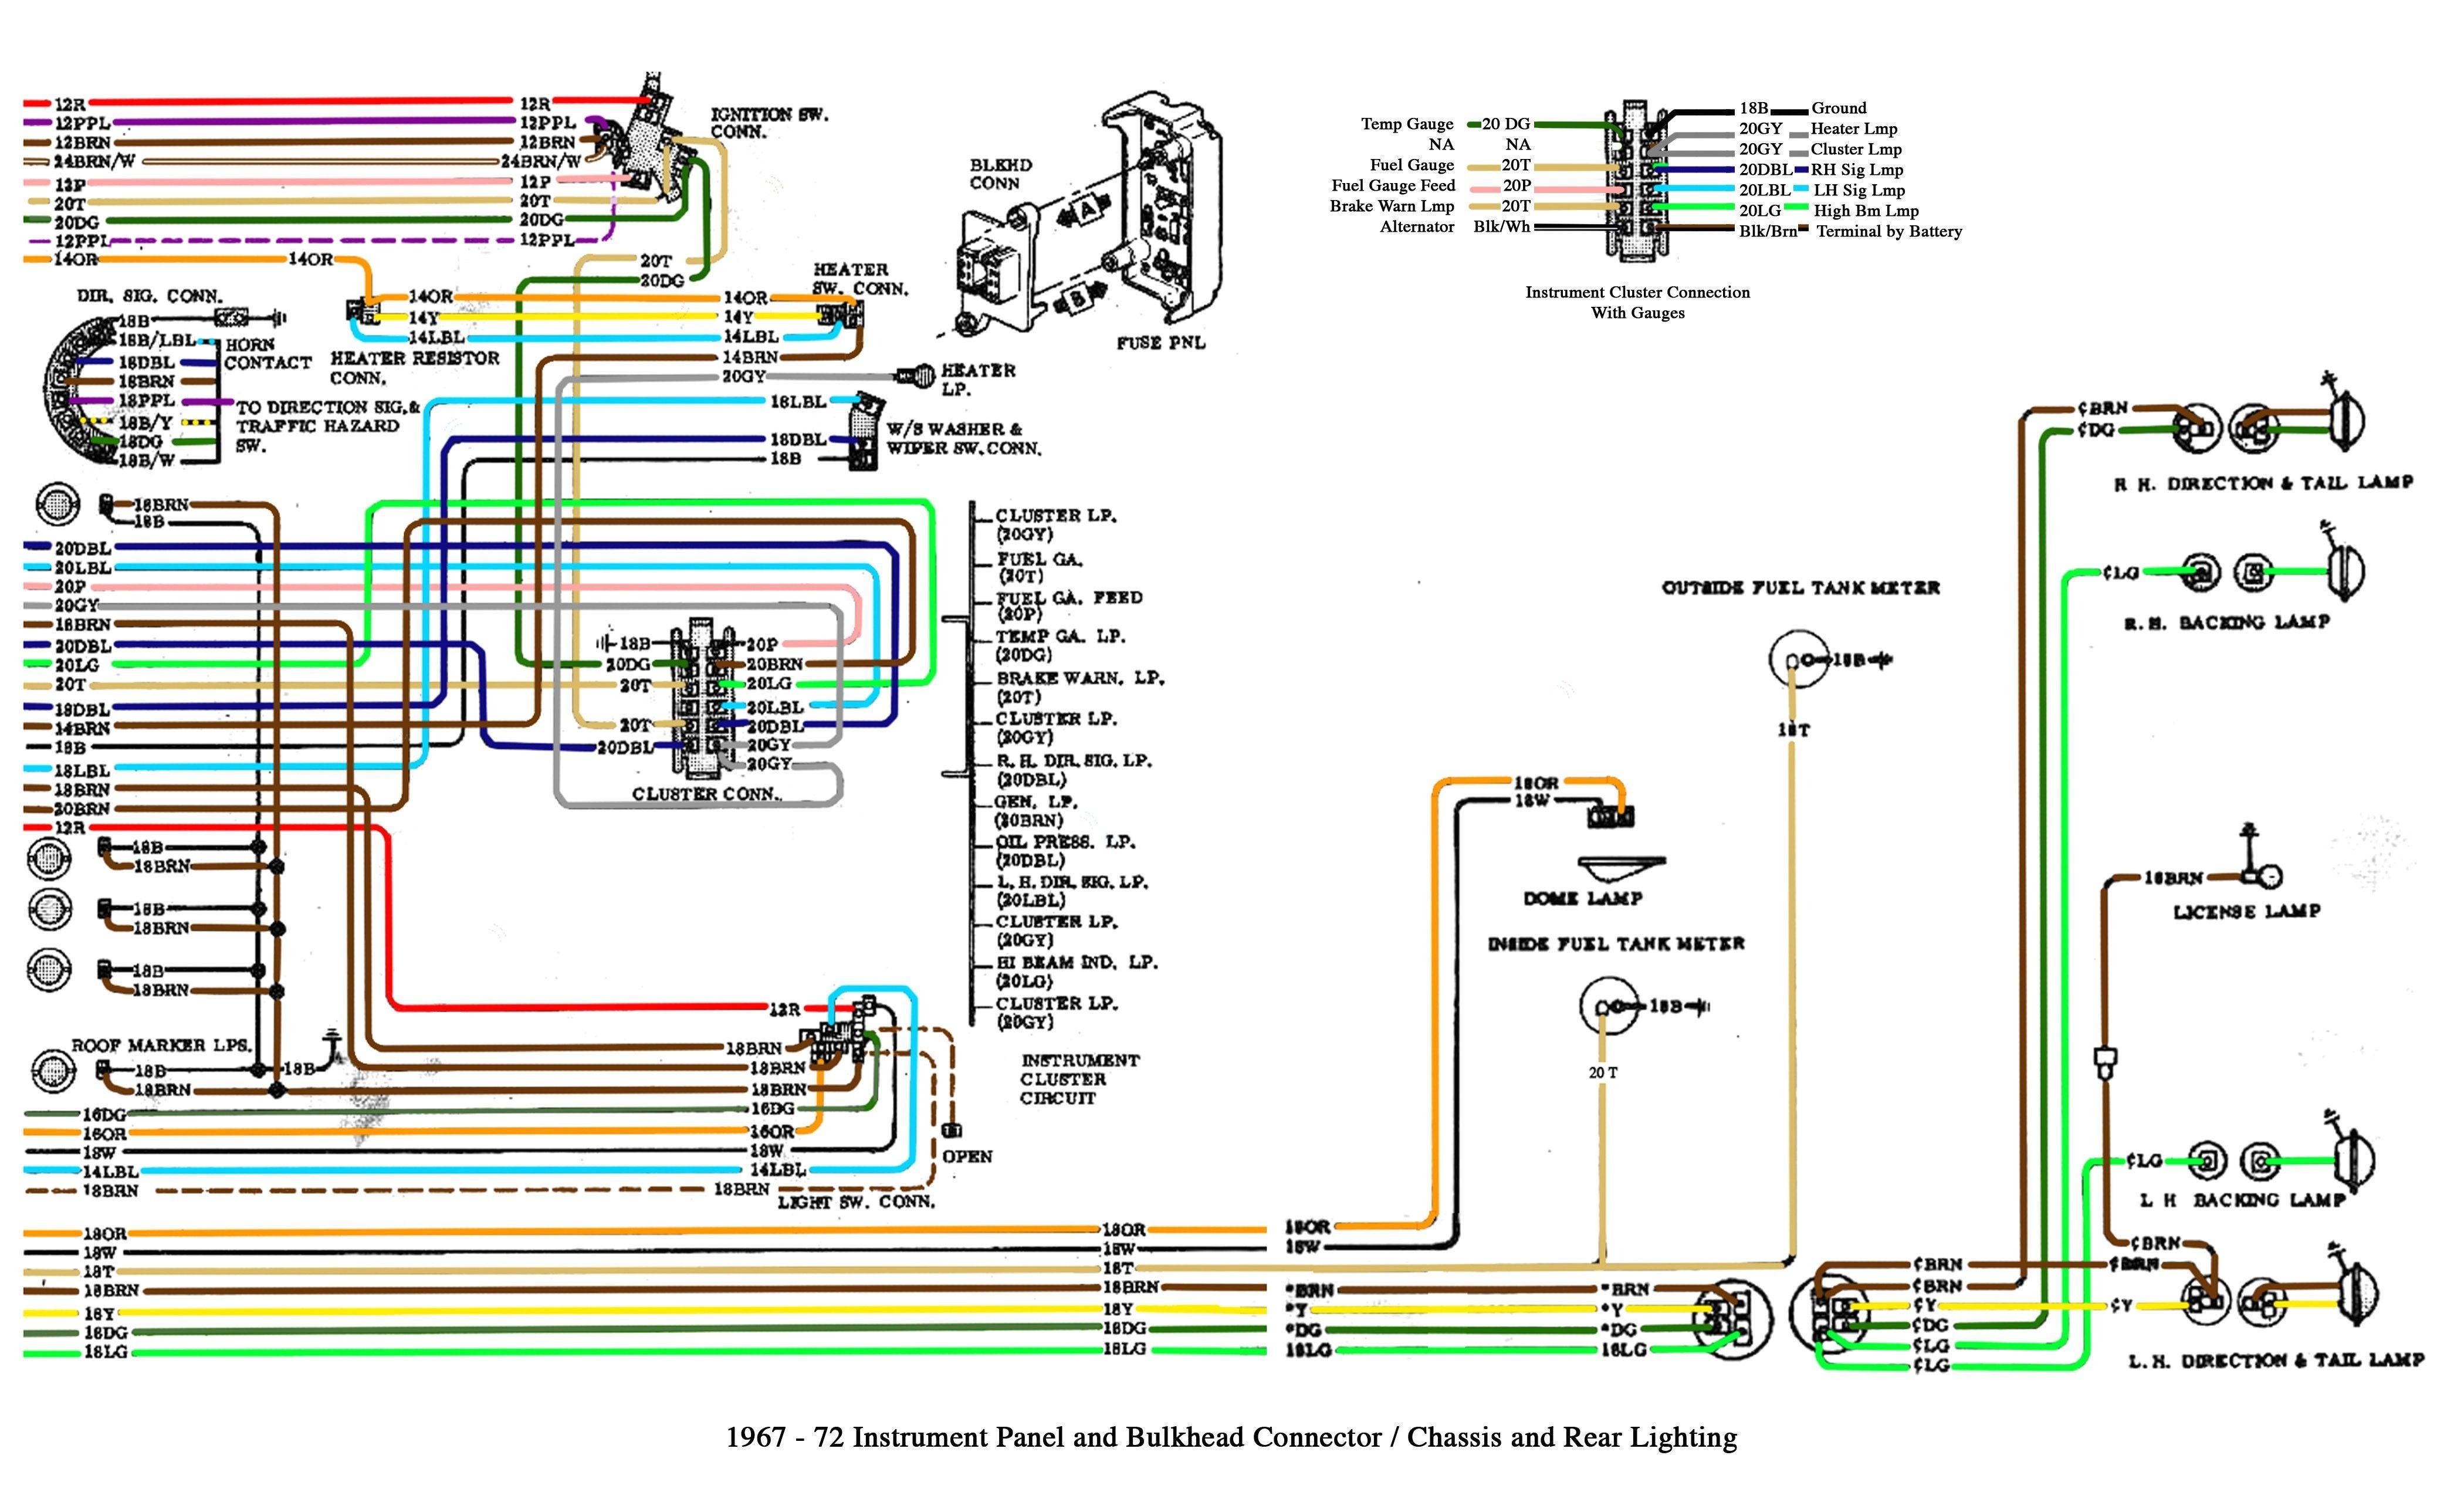 2005 Silverado Trailer Wiring Diagram New In 2020 72 Chevy Truck Chevy Trucks Truck Stereo